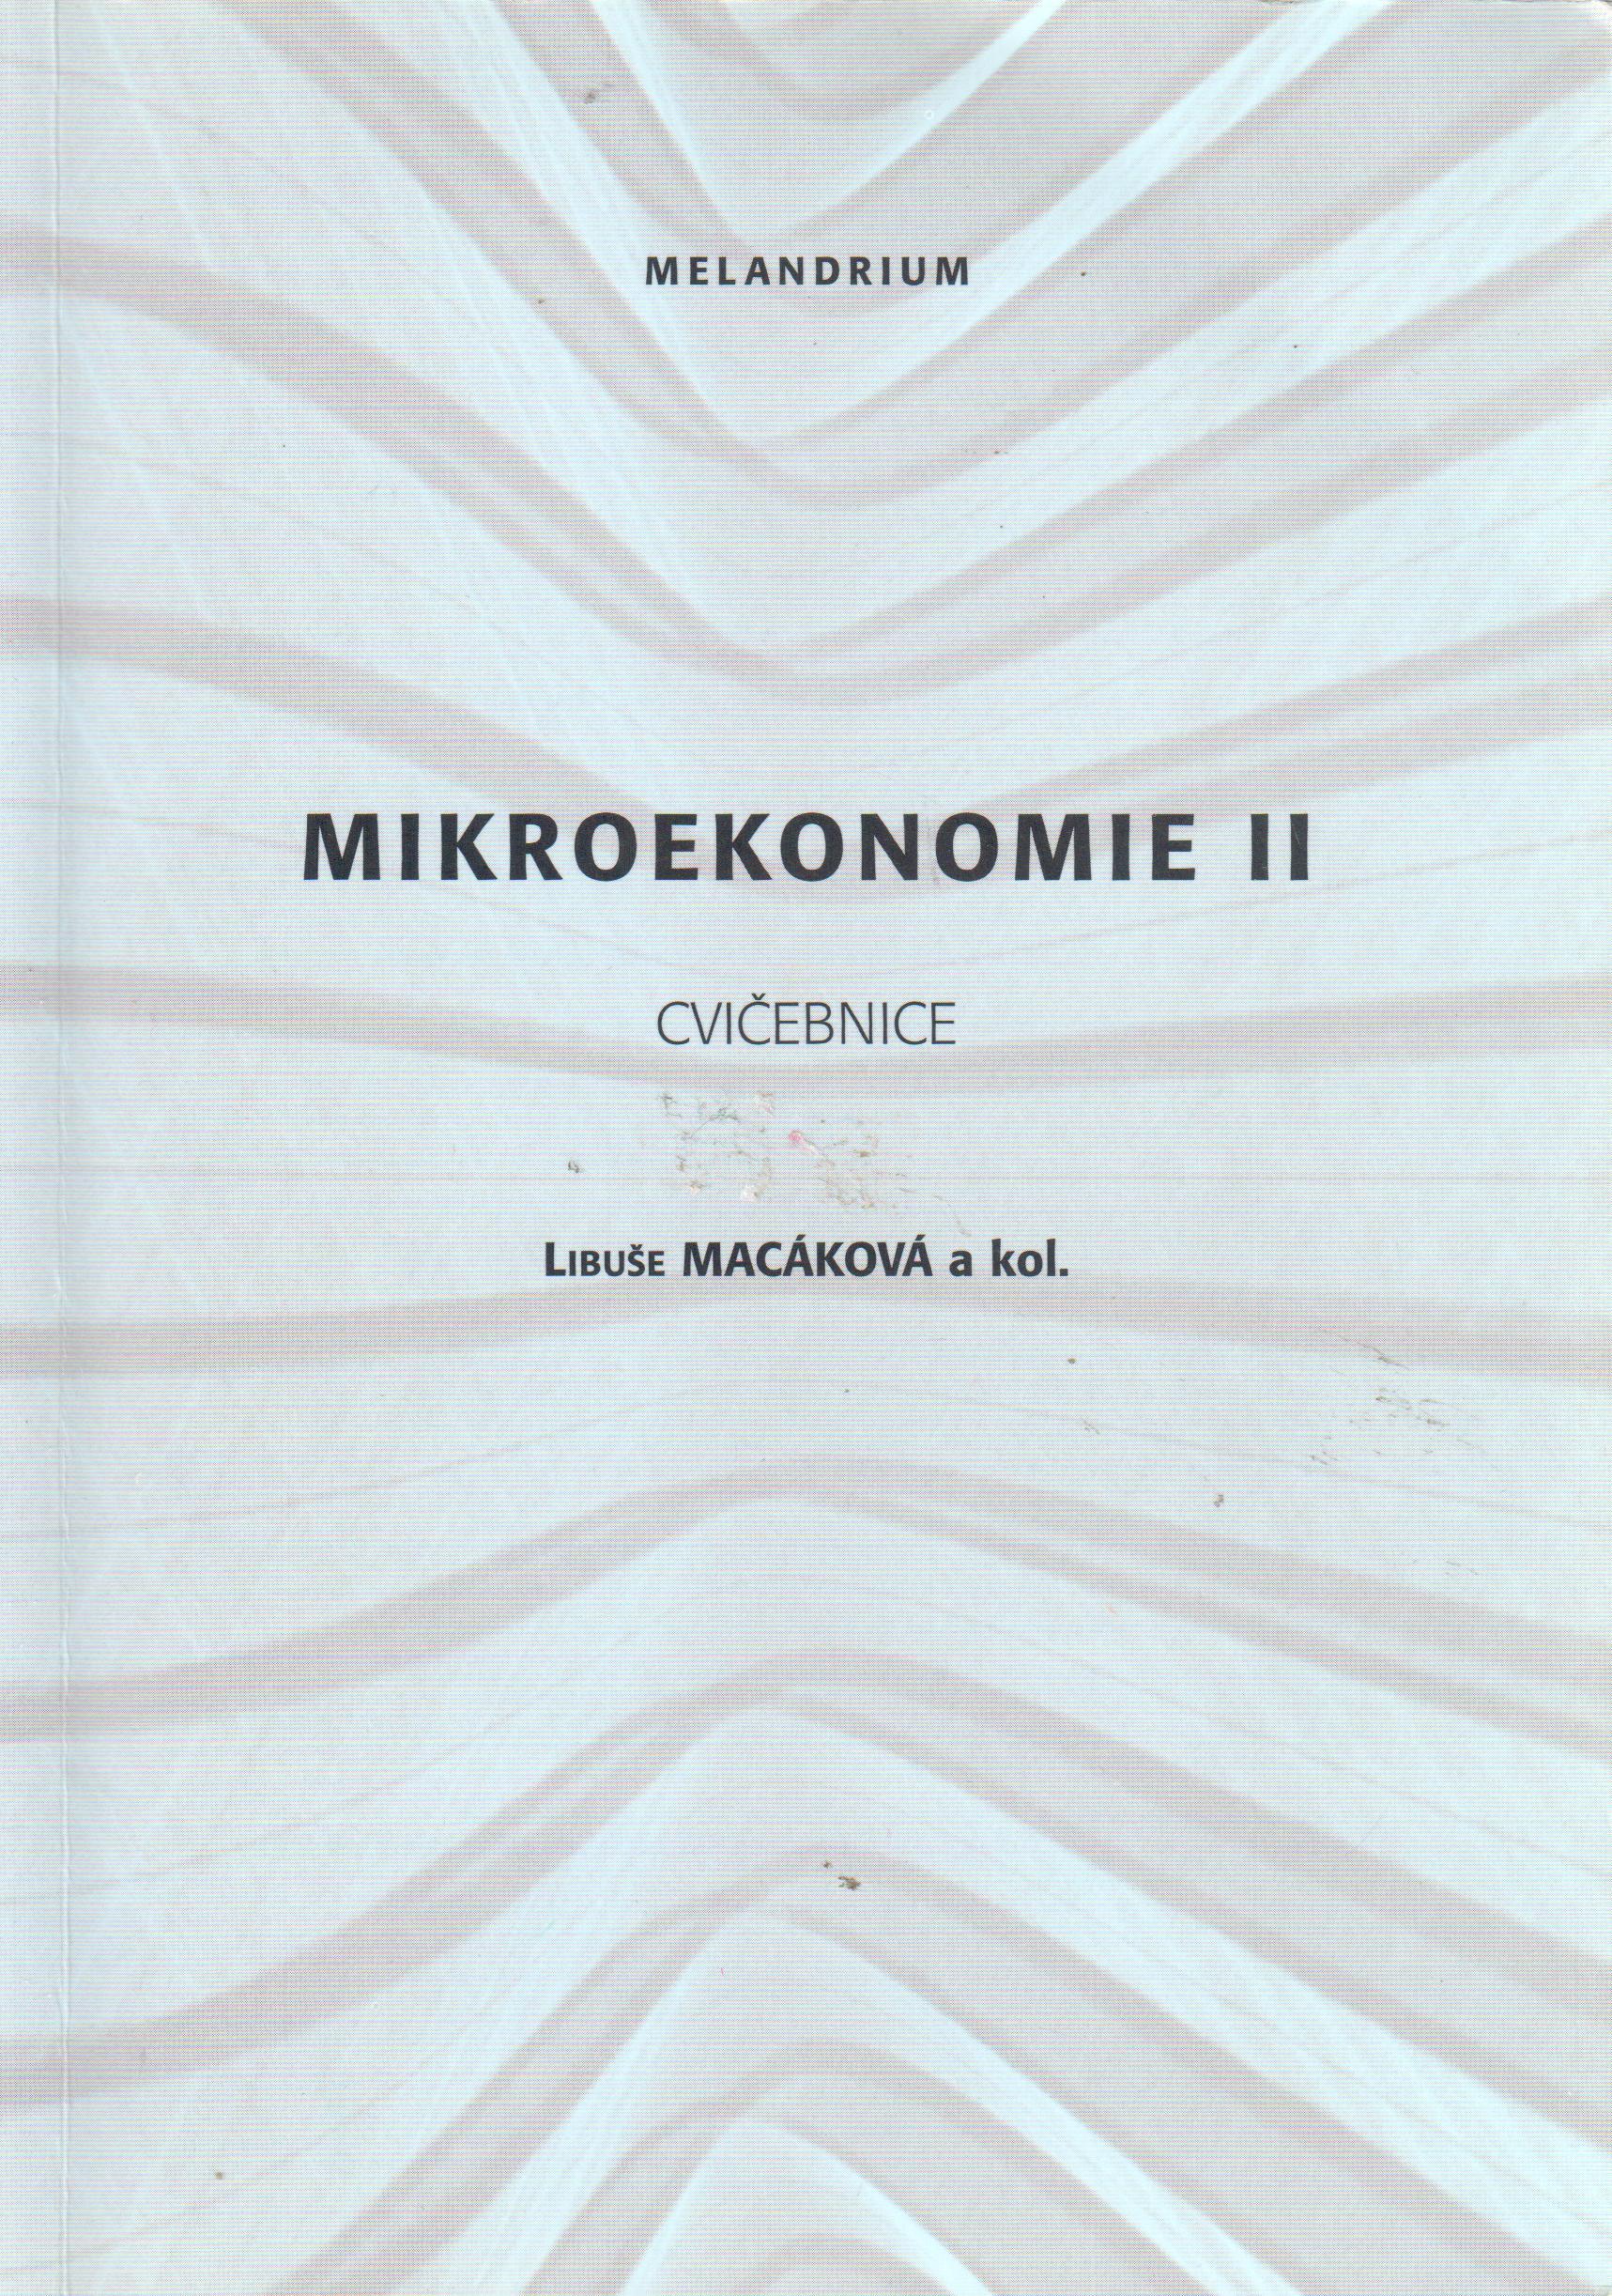 Mikroekonomie II (cvičebnice) - Náhled učebnice